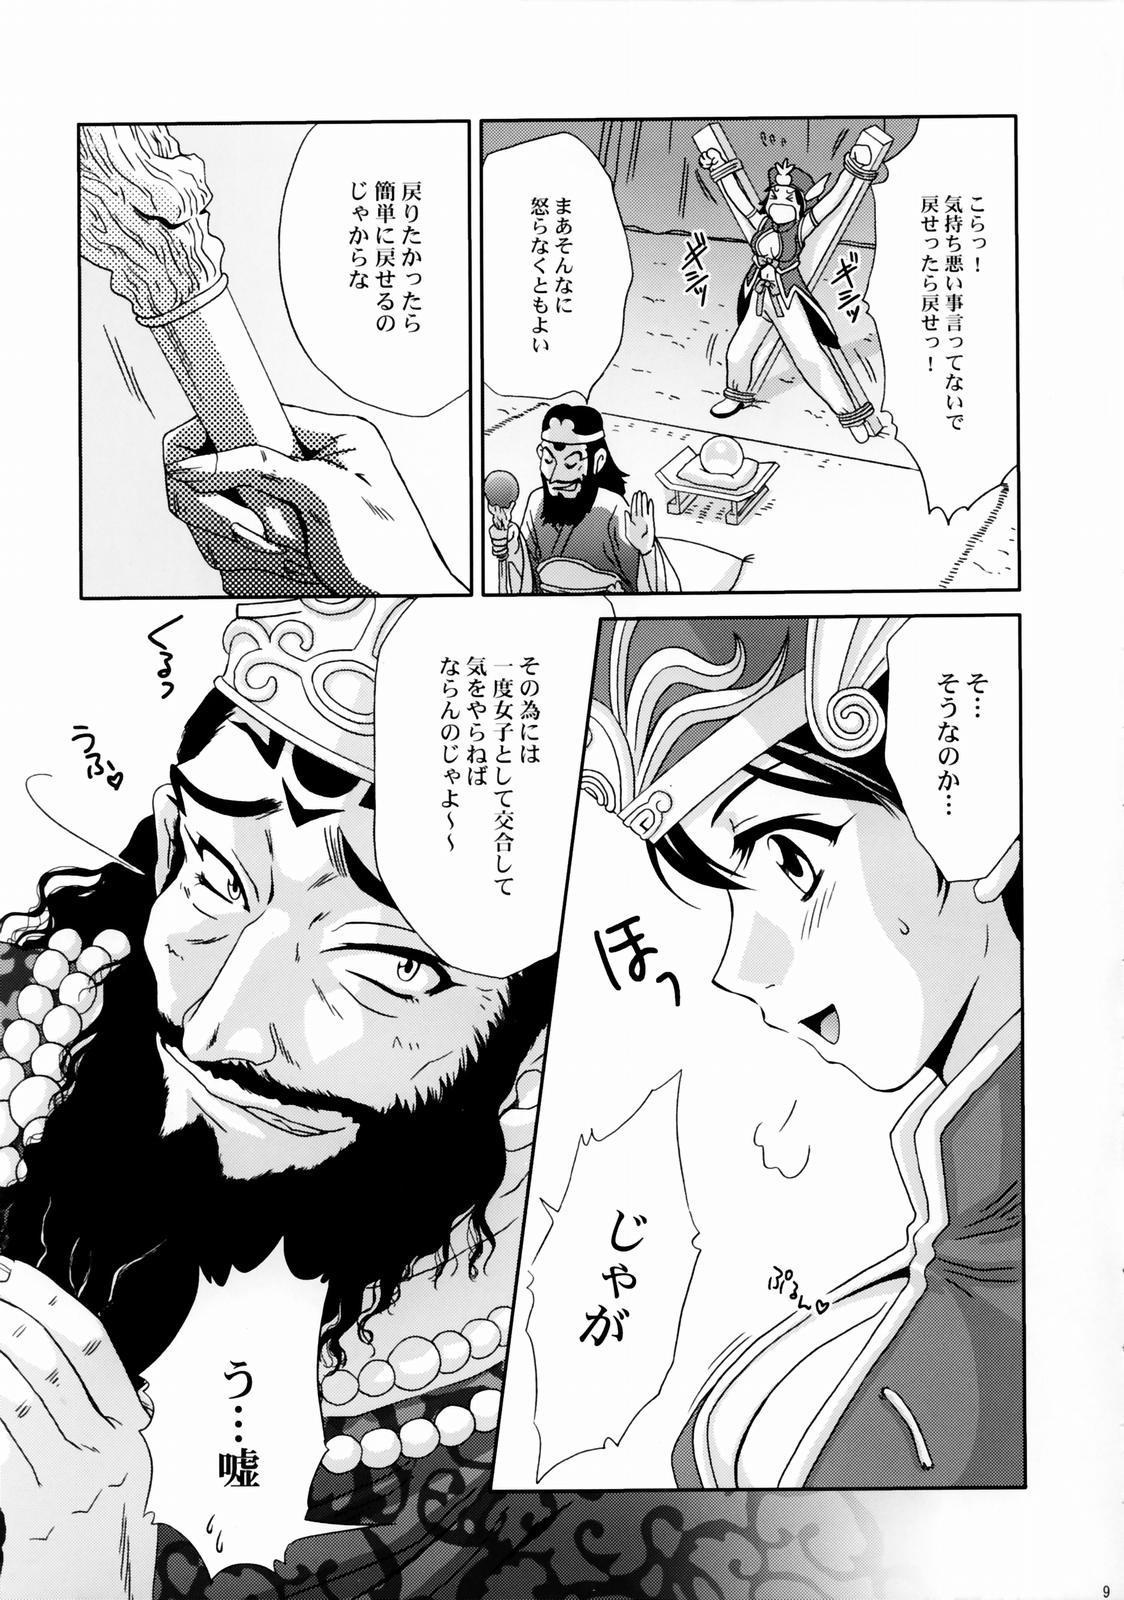 In Sangoku Musou Rikuson Gaiden 7